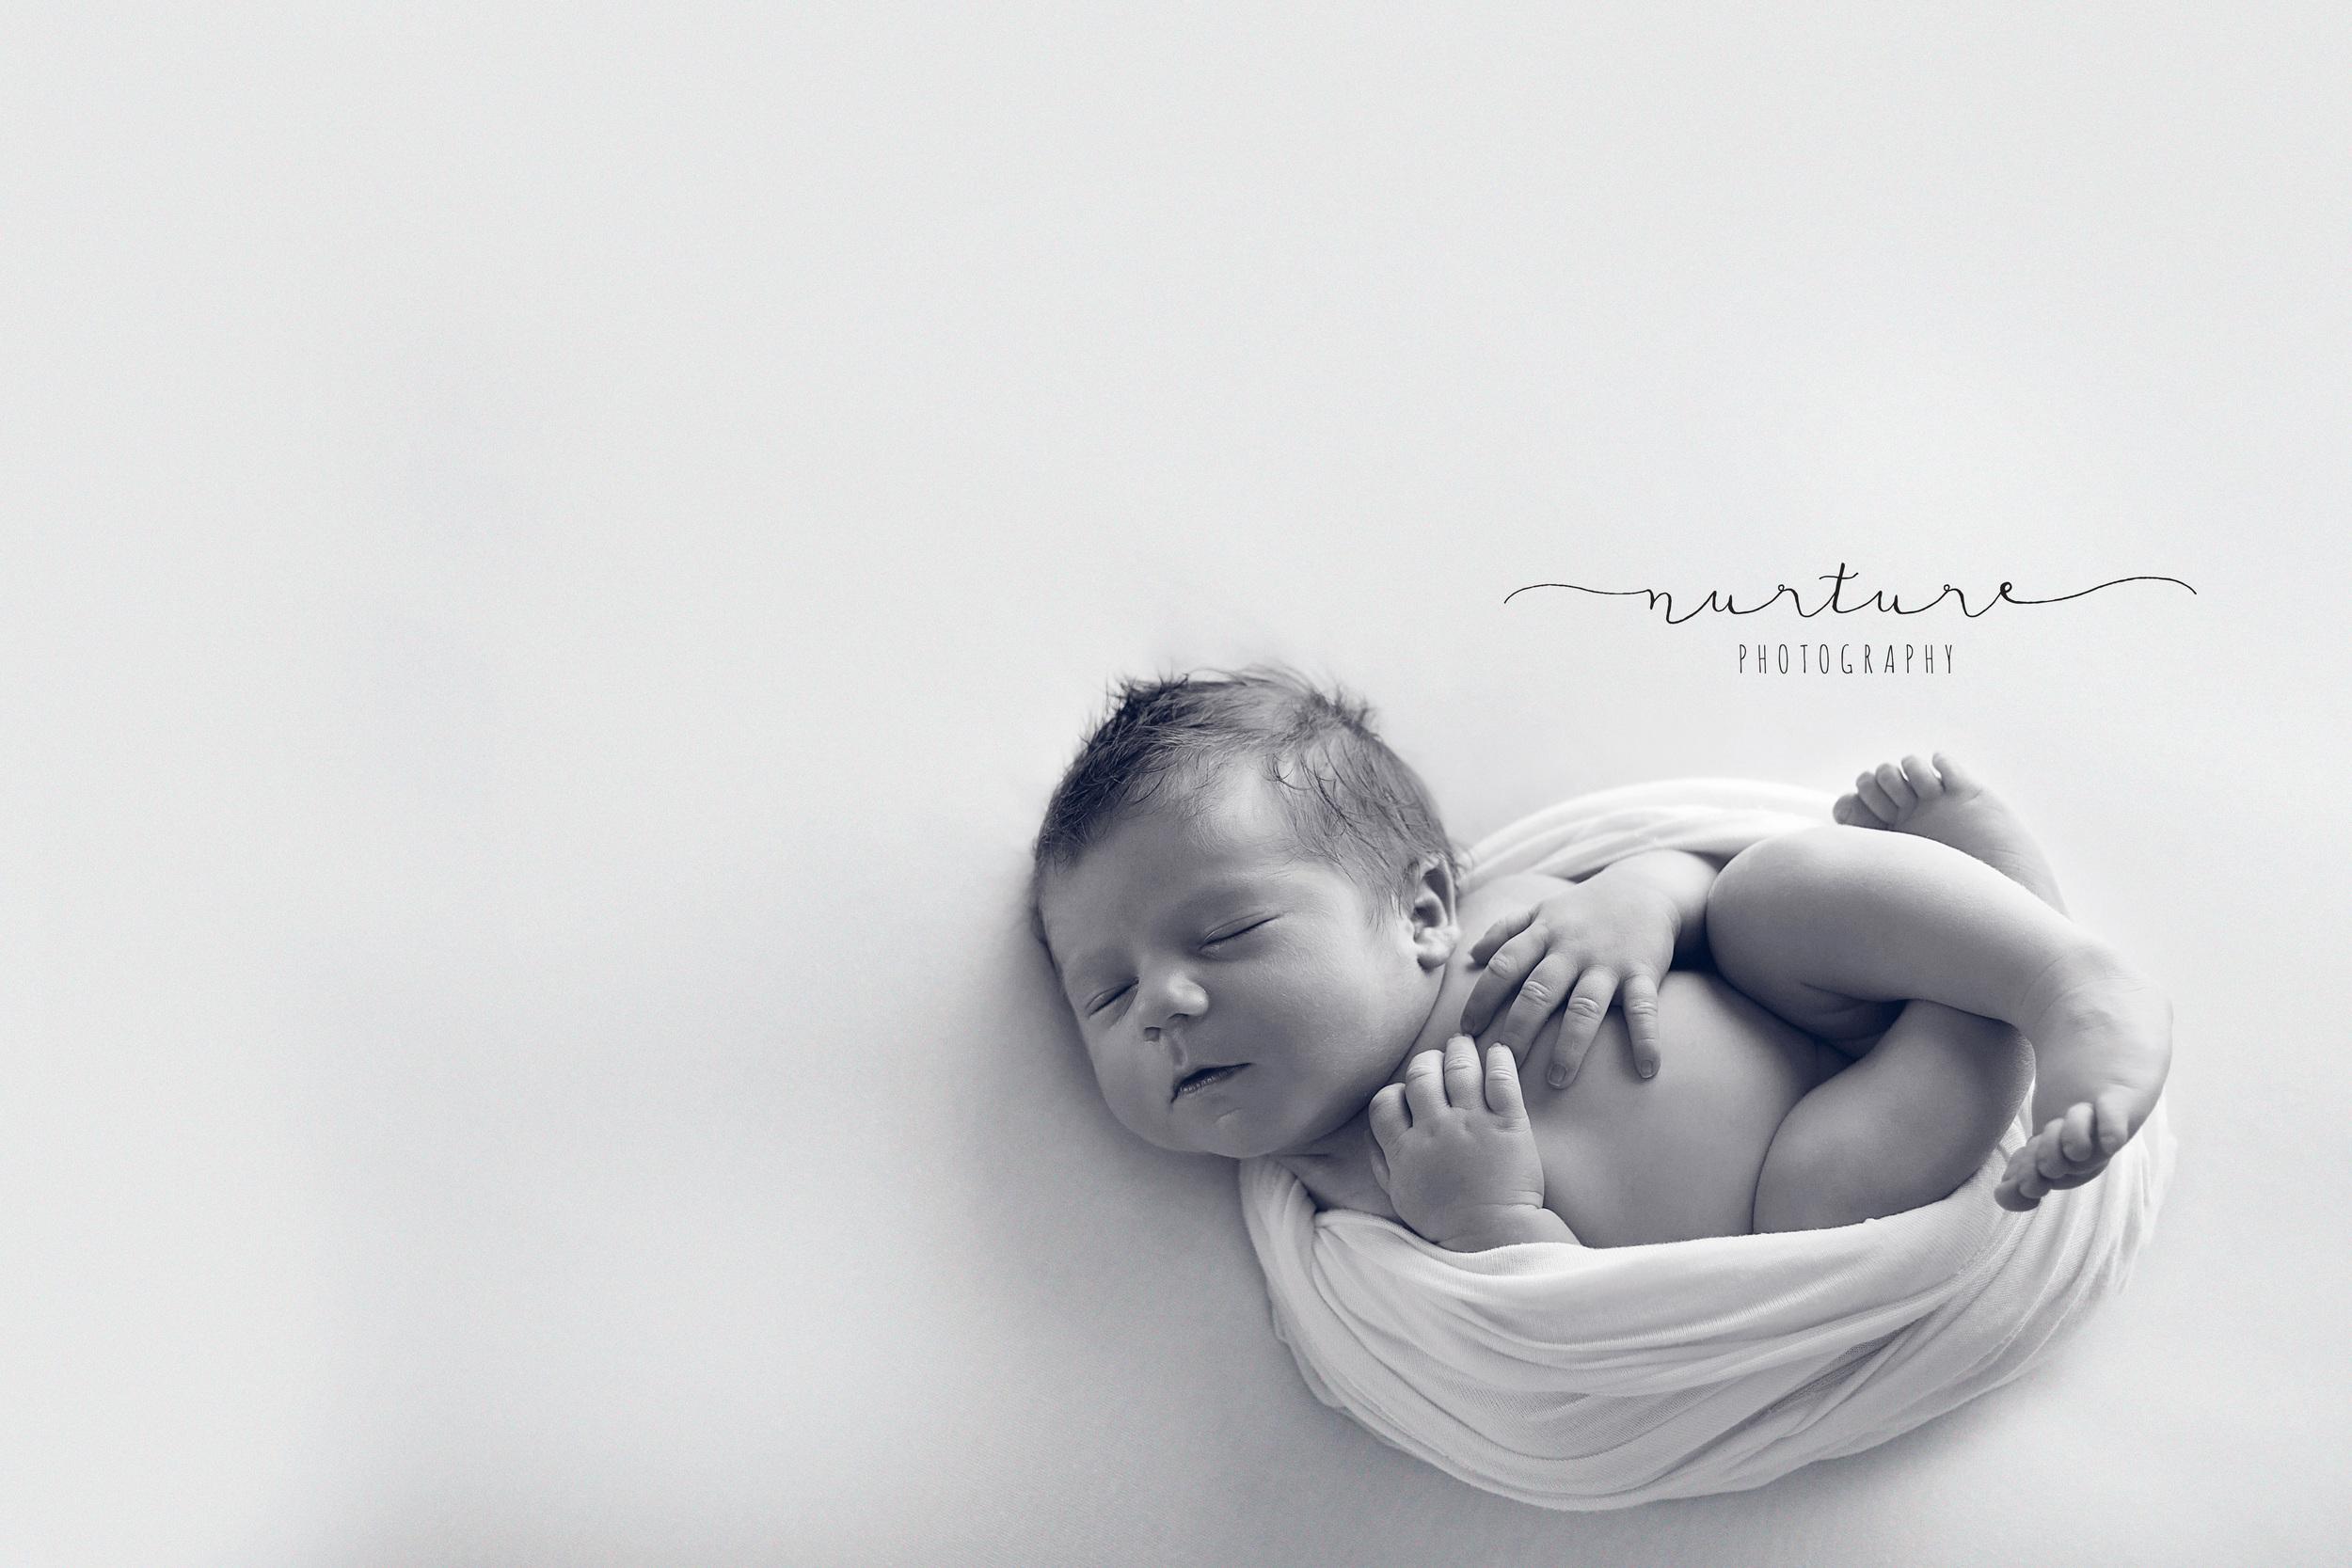 torrance-redondobeach-hermosabeach-manhattanbeach-palosverdes-southbay-photographer-newborn-baby-newbornphotographer-nurturephotography-babyphotographer-newbornphotographer 9764.jpg